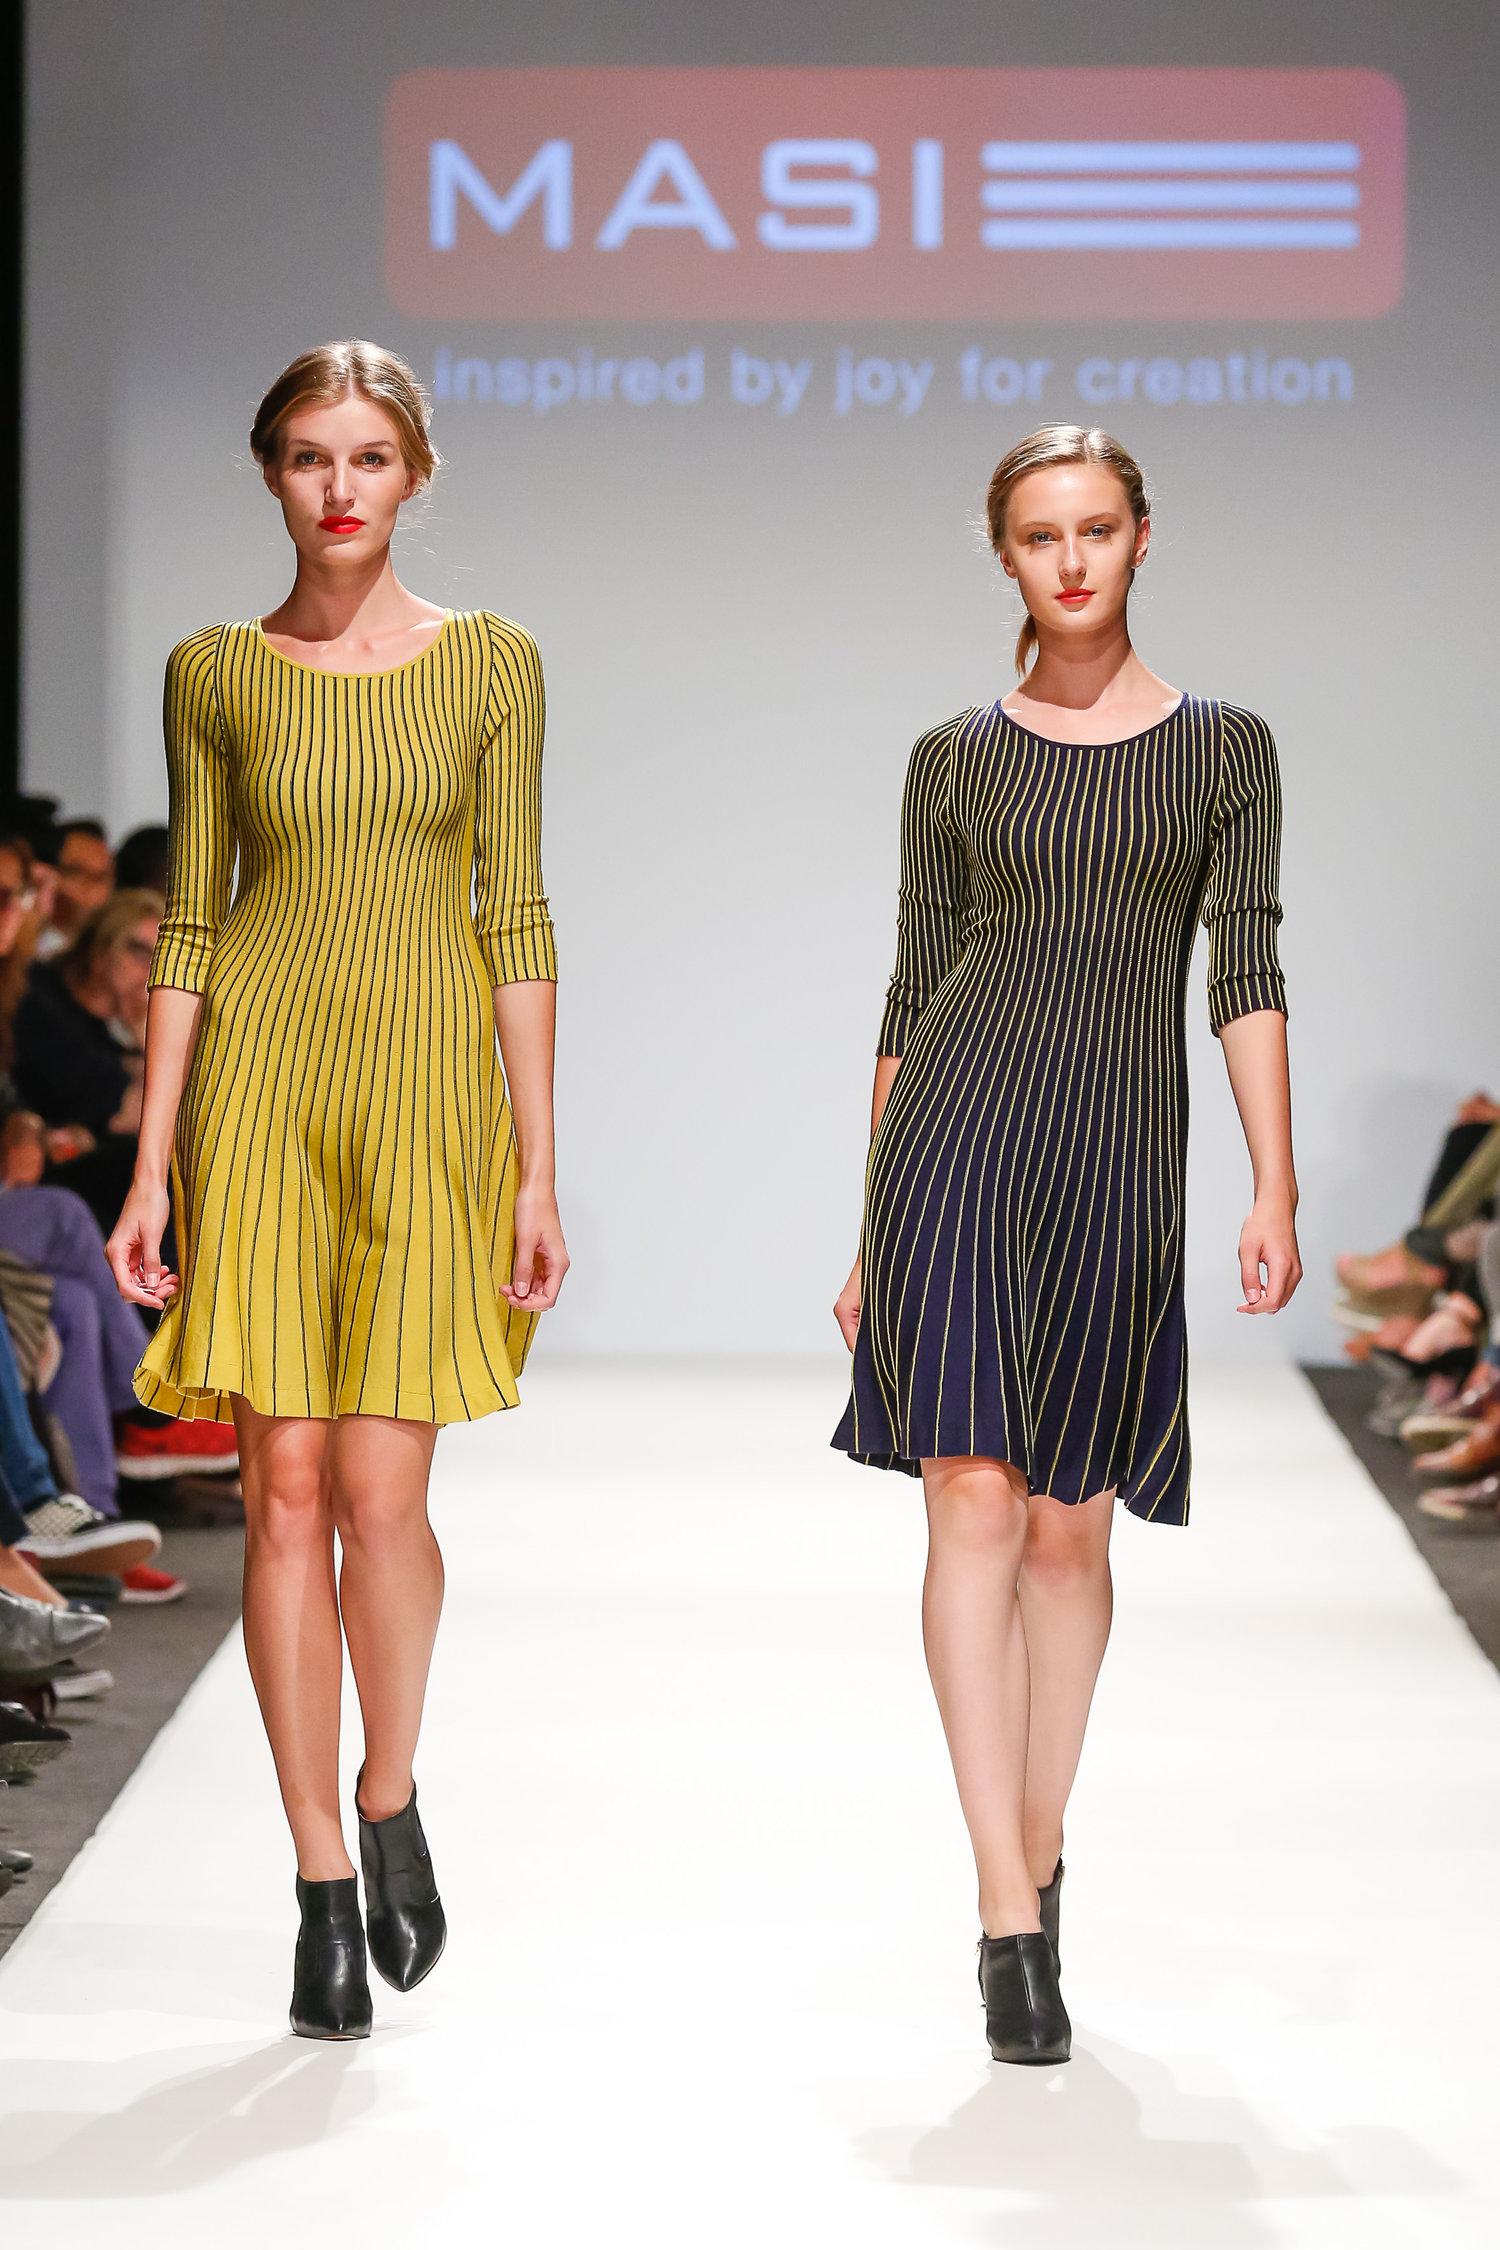 2016 Vienna Fashion Week Masi